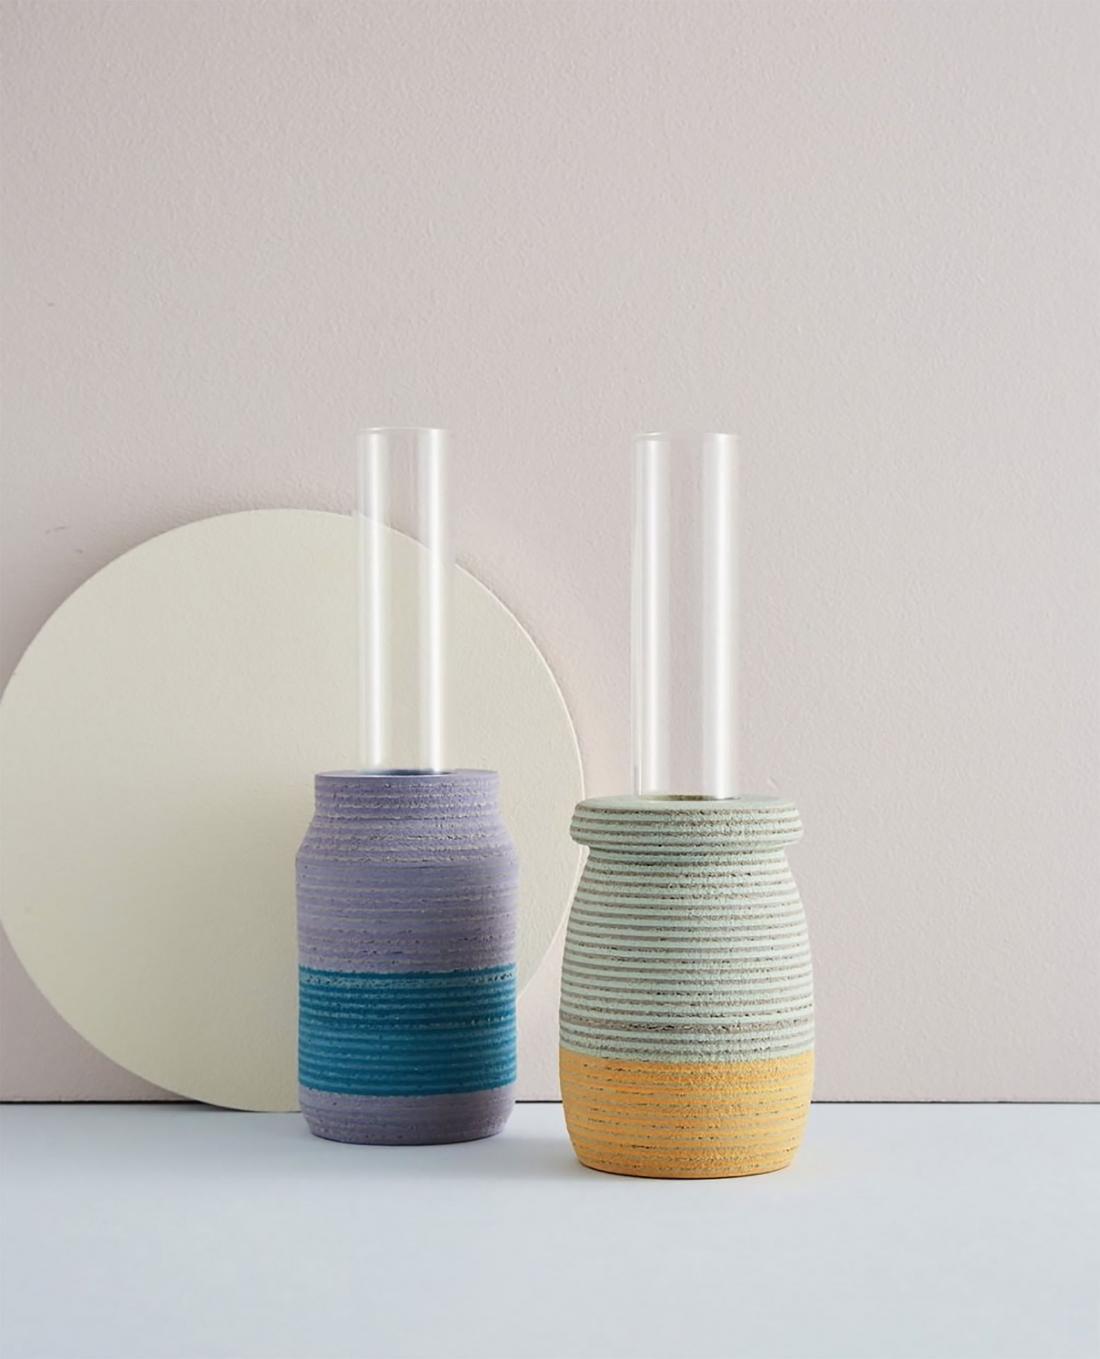 Laura-Jane Atkinson's LIO single stem vases